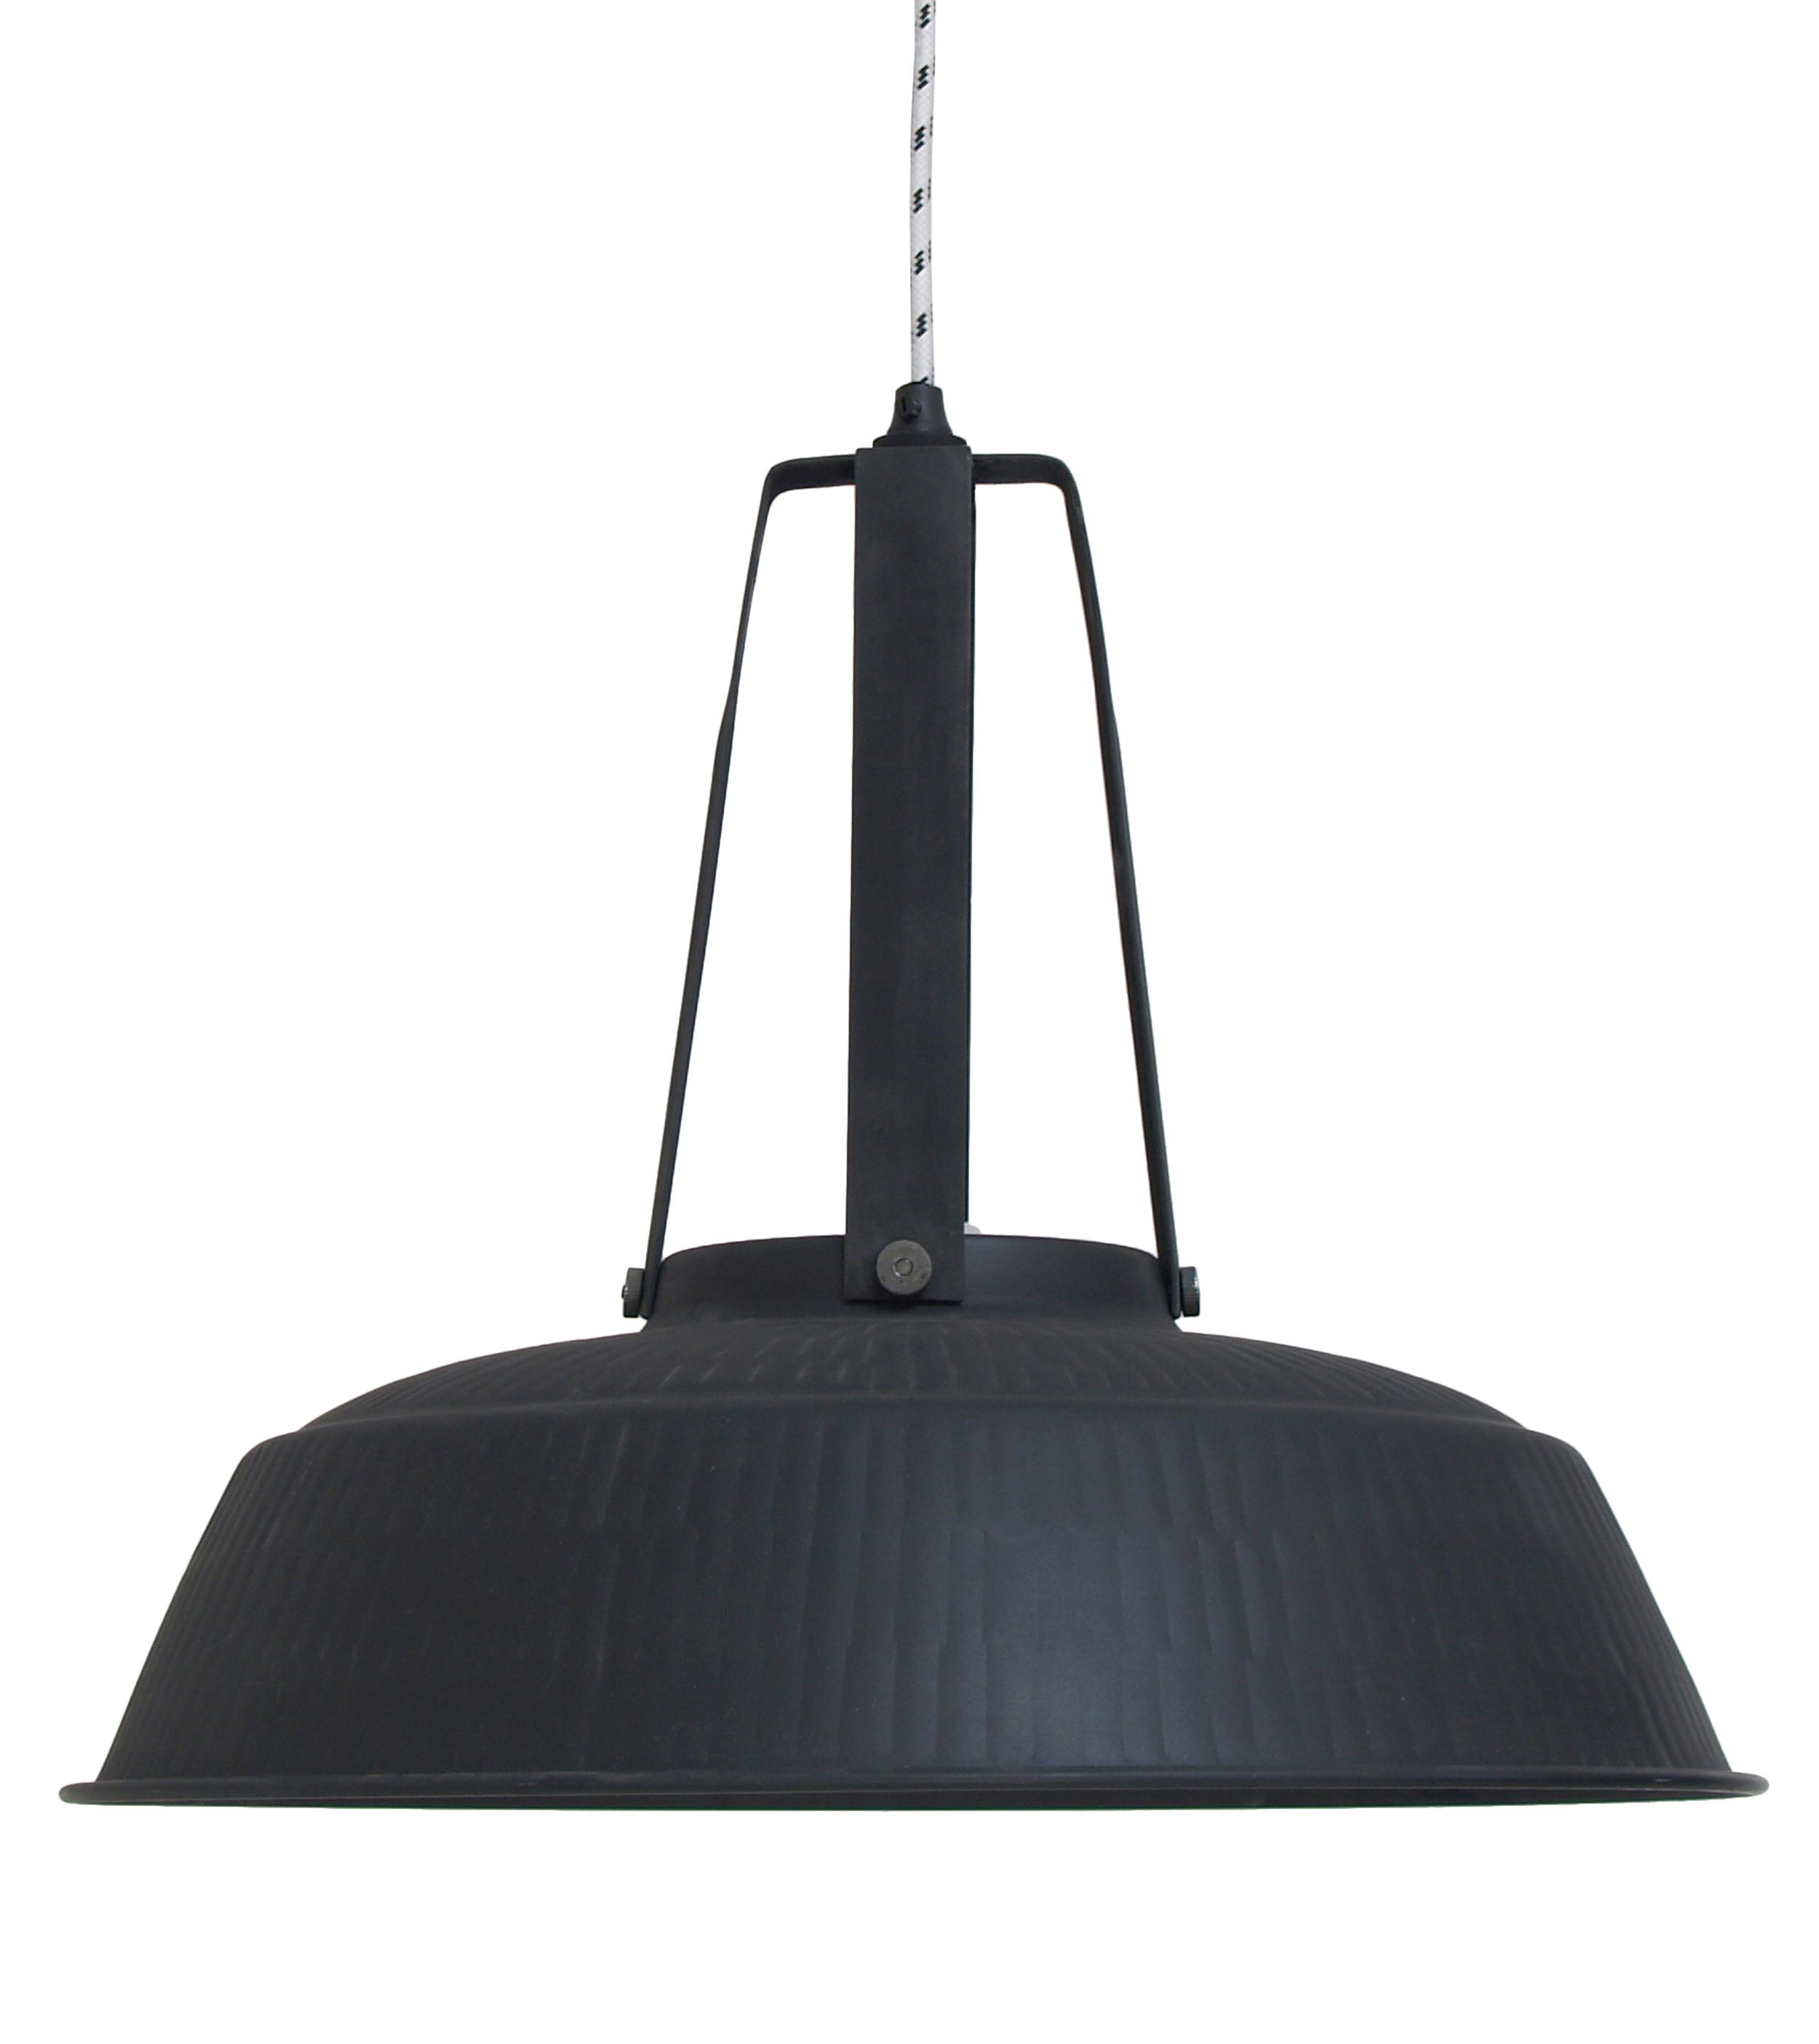 fabriekslamp mat zwart bestel 39 m bij. Black Bedroom Furniture Sets. Home Design Ideas